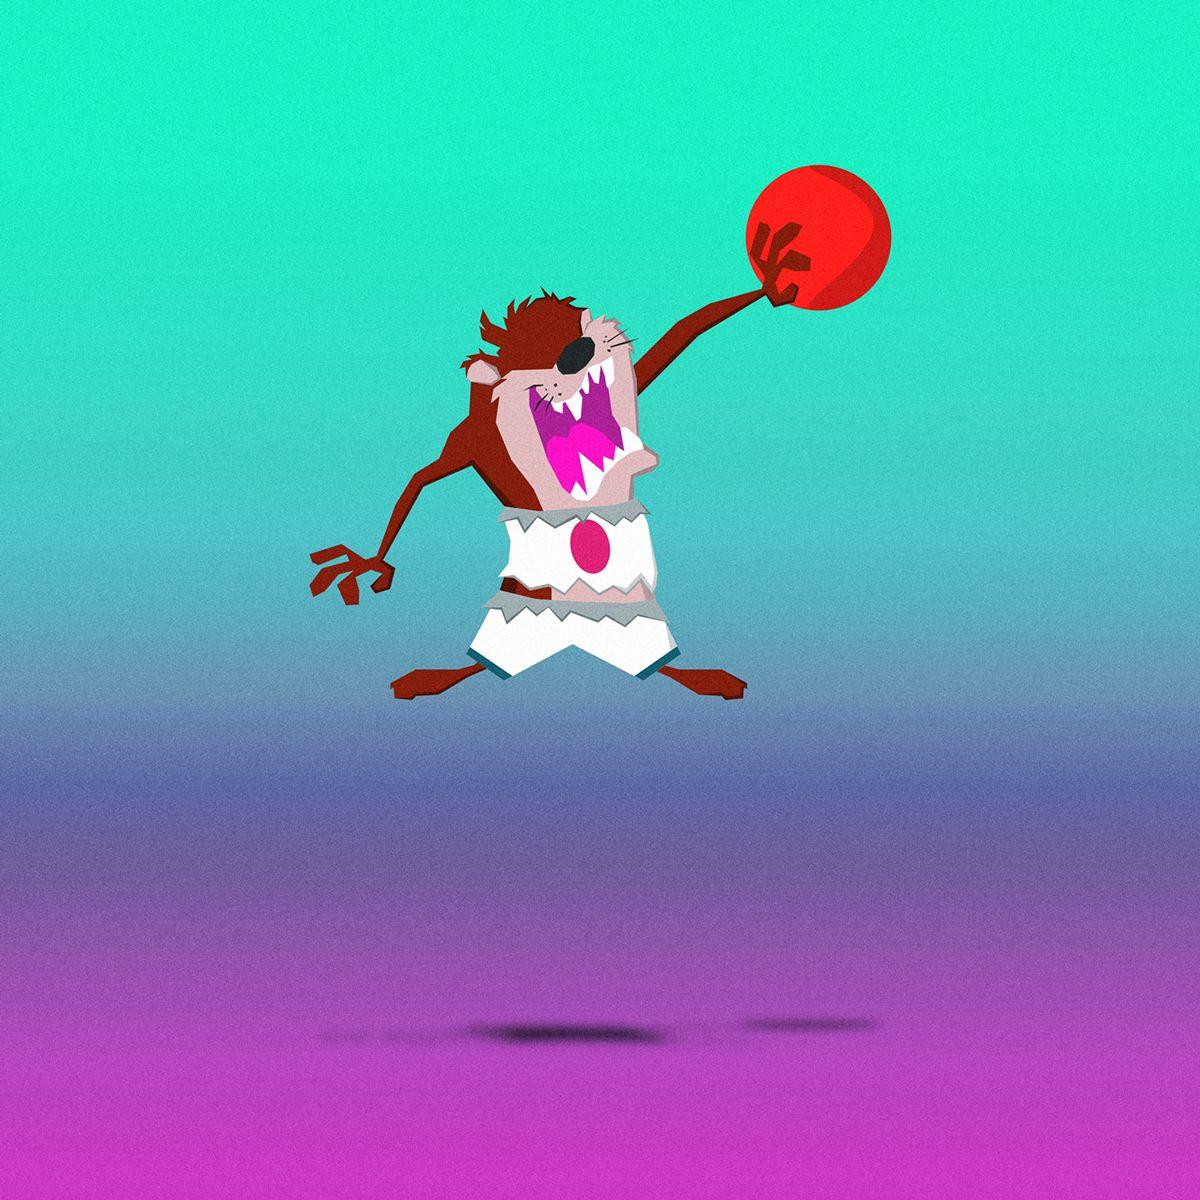 / Space Jam / on Behance #spacejam #michaeljordan #jumpman23 #jumpman #basketball #movies #cartoons #tasmaniandevil